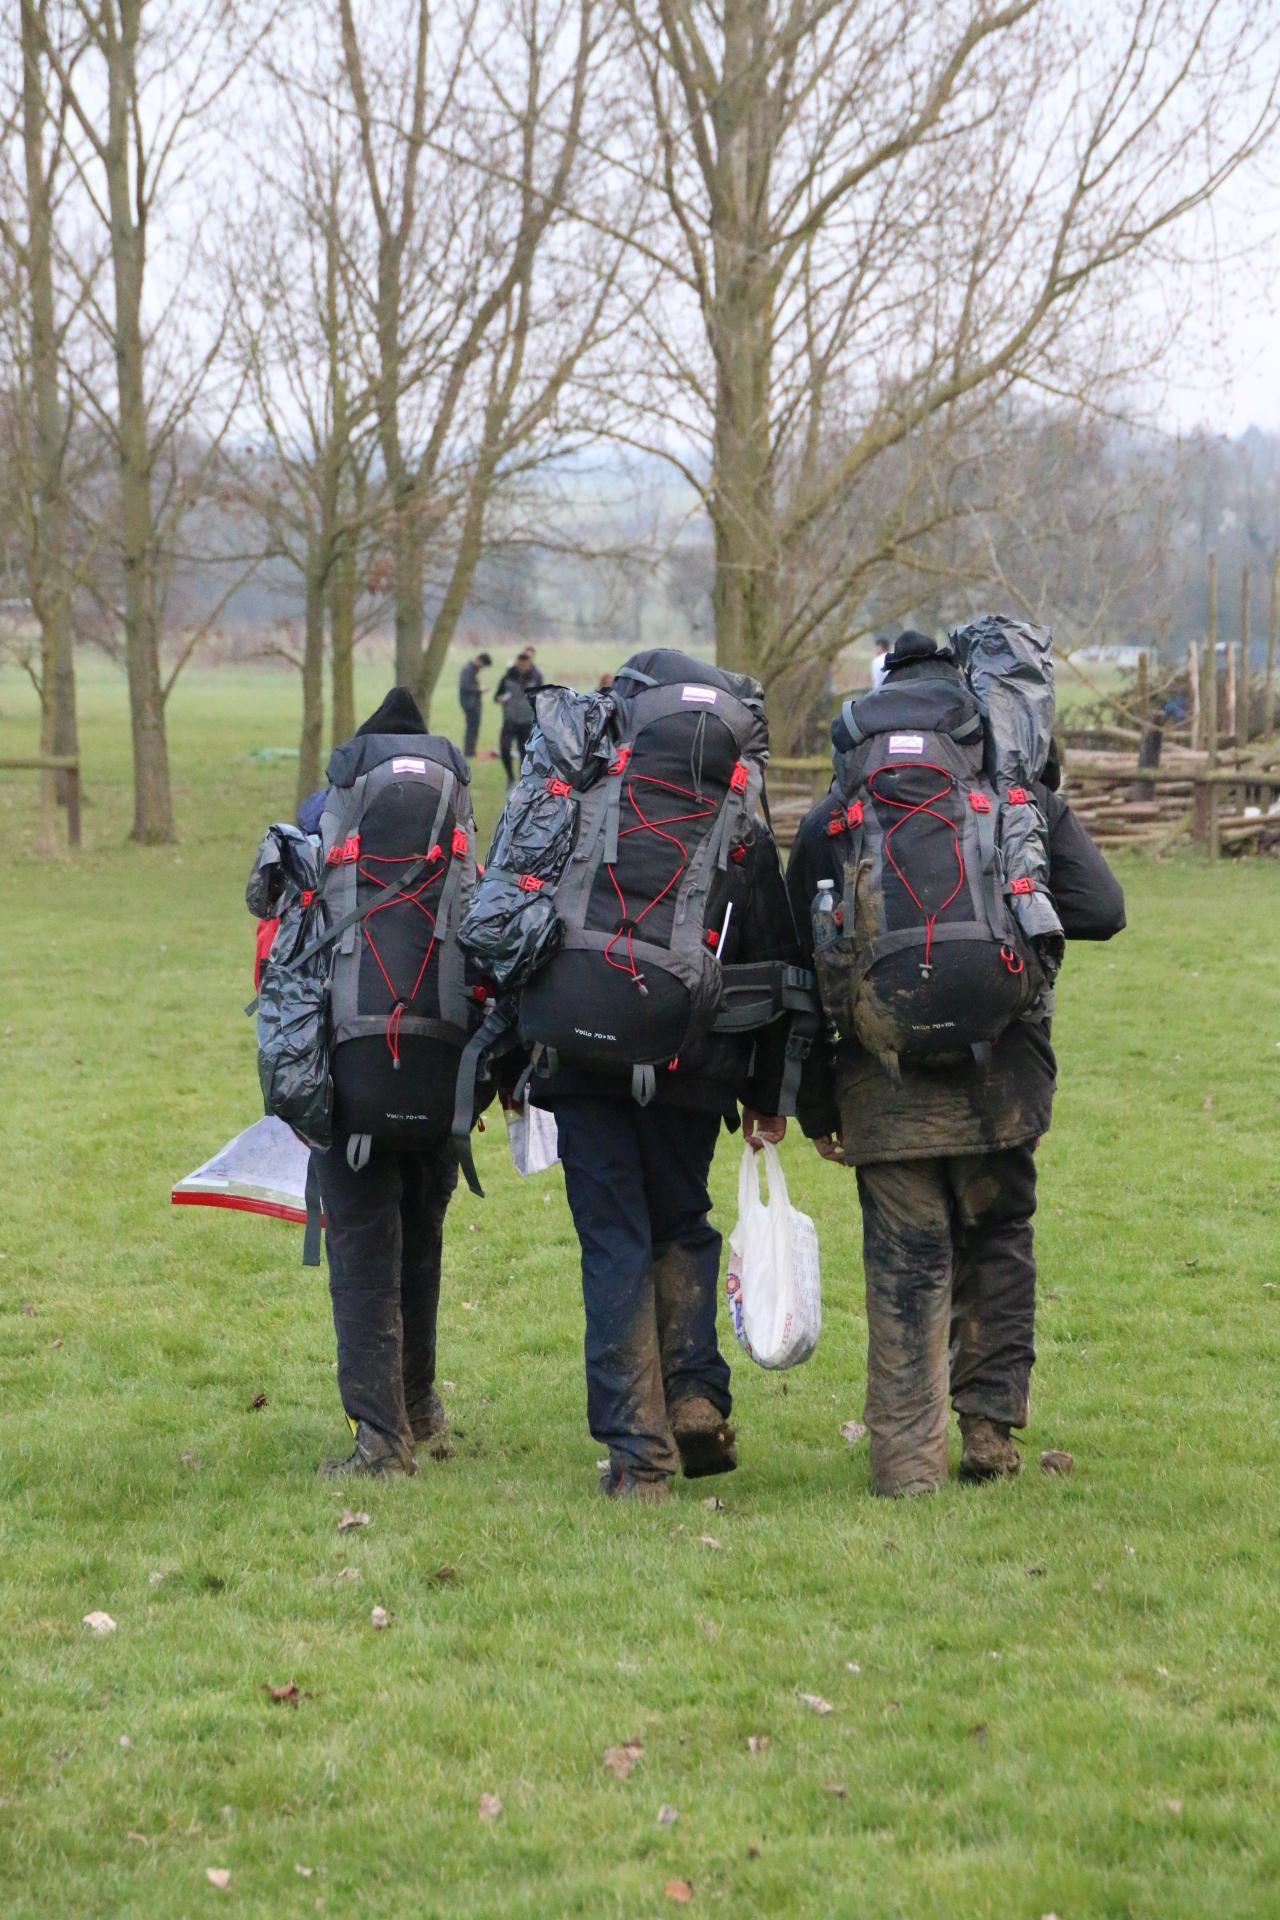 Arriving at Campsite